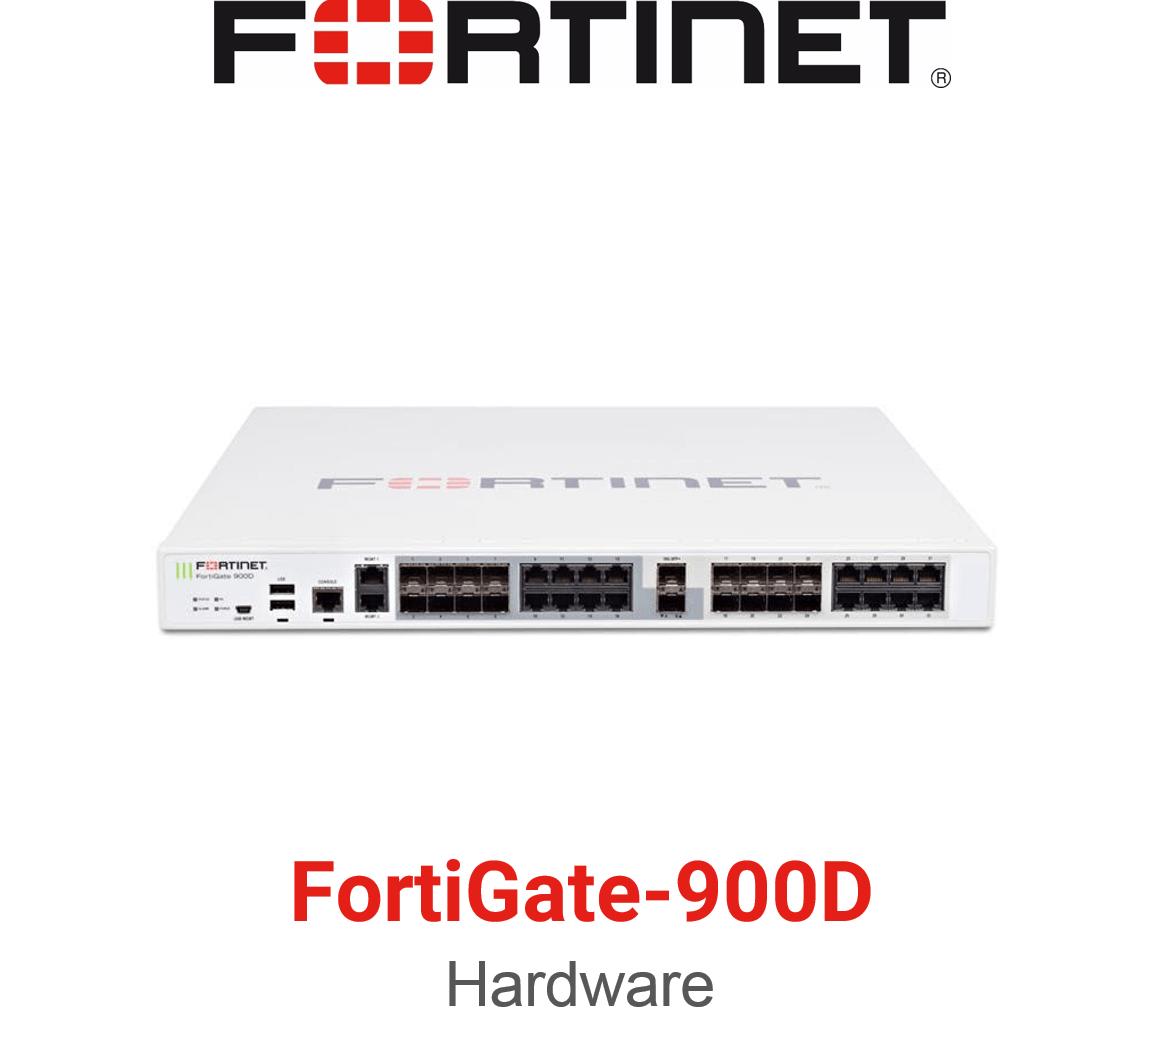 Fortinet FortiGate-900D